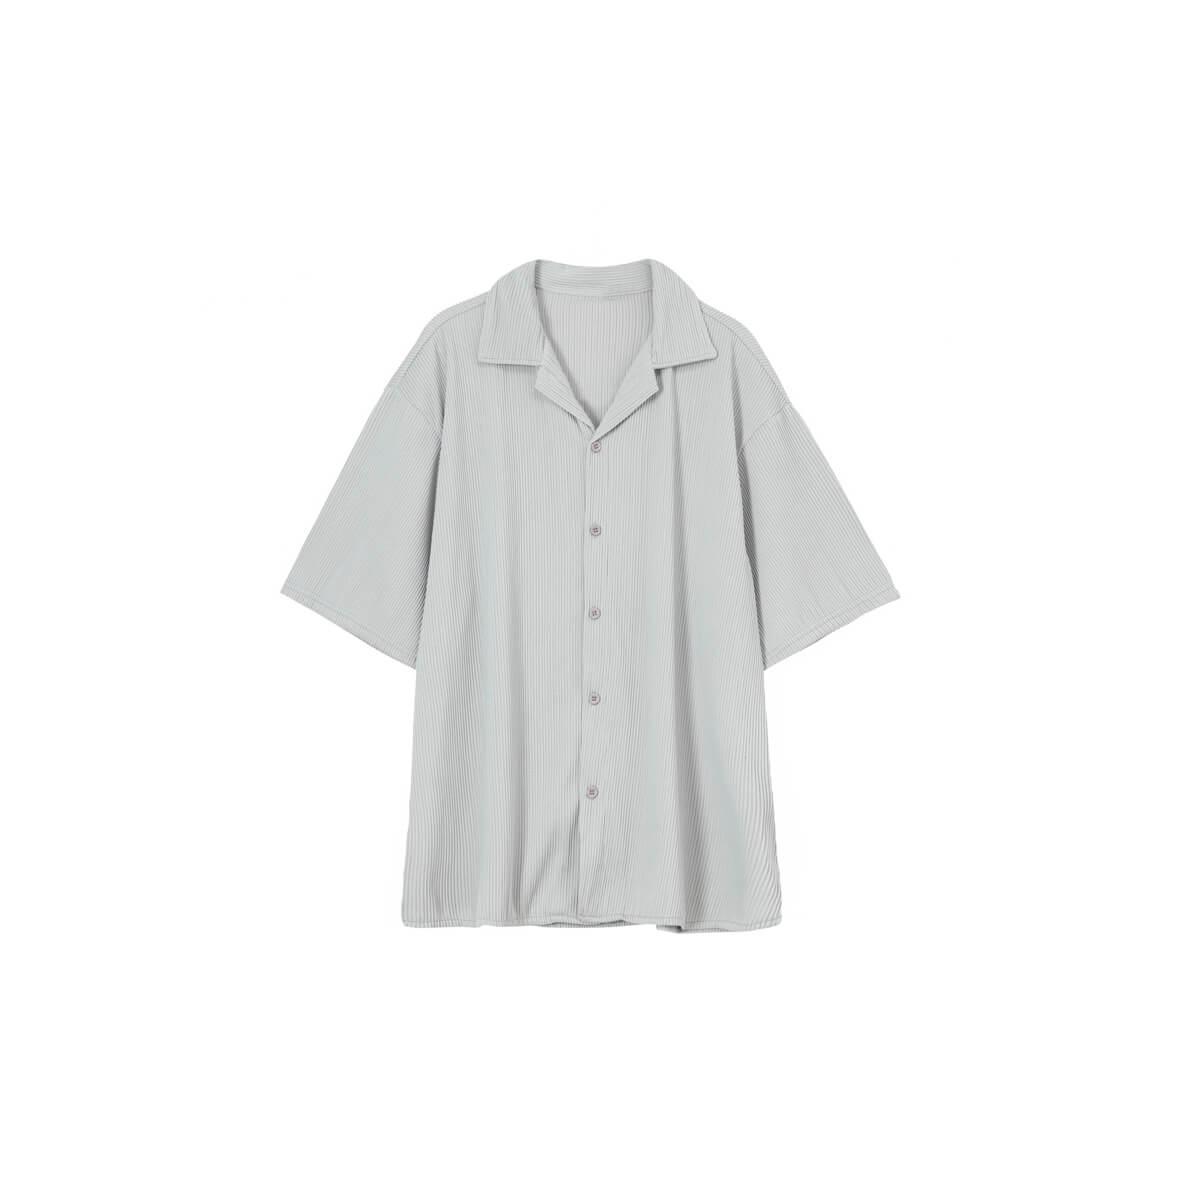 Рубашка Cui Layout Studio Shirt Cuban Collar Vertical Texture Gray